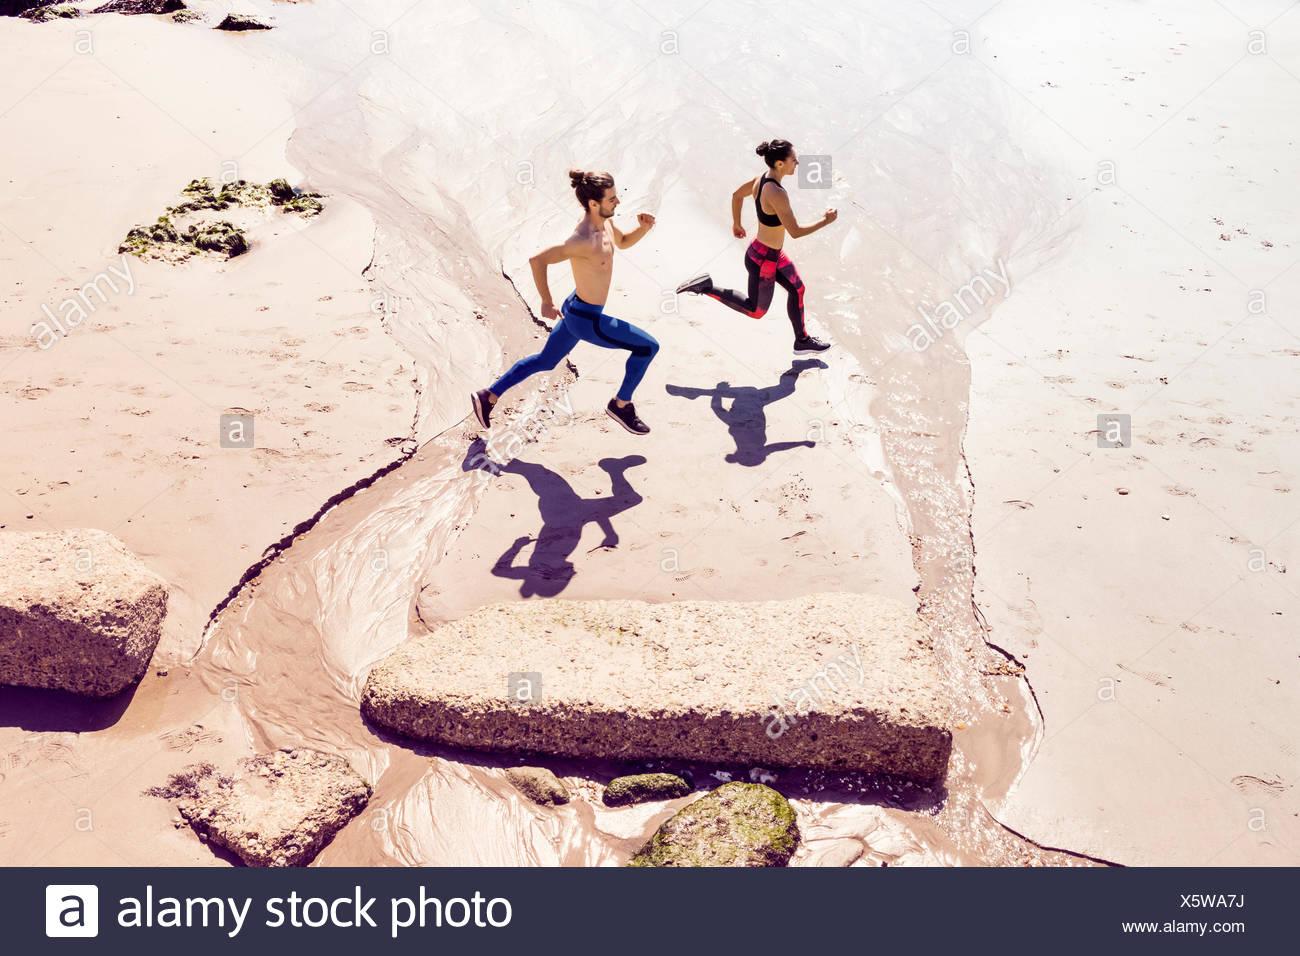 Junger Mann und Frau Strand entlang läuft, Erhöhte Ansicht Stockbild